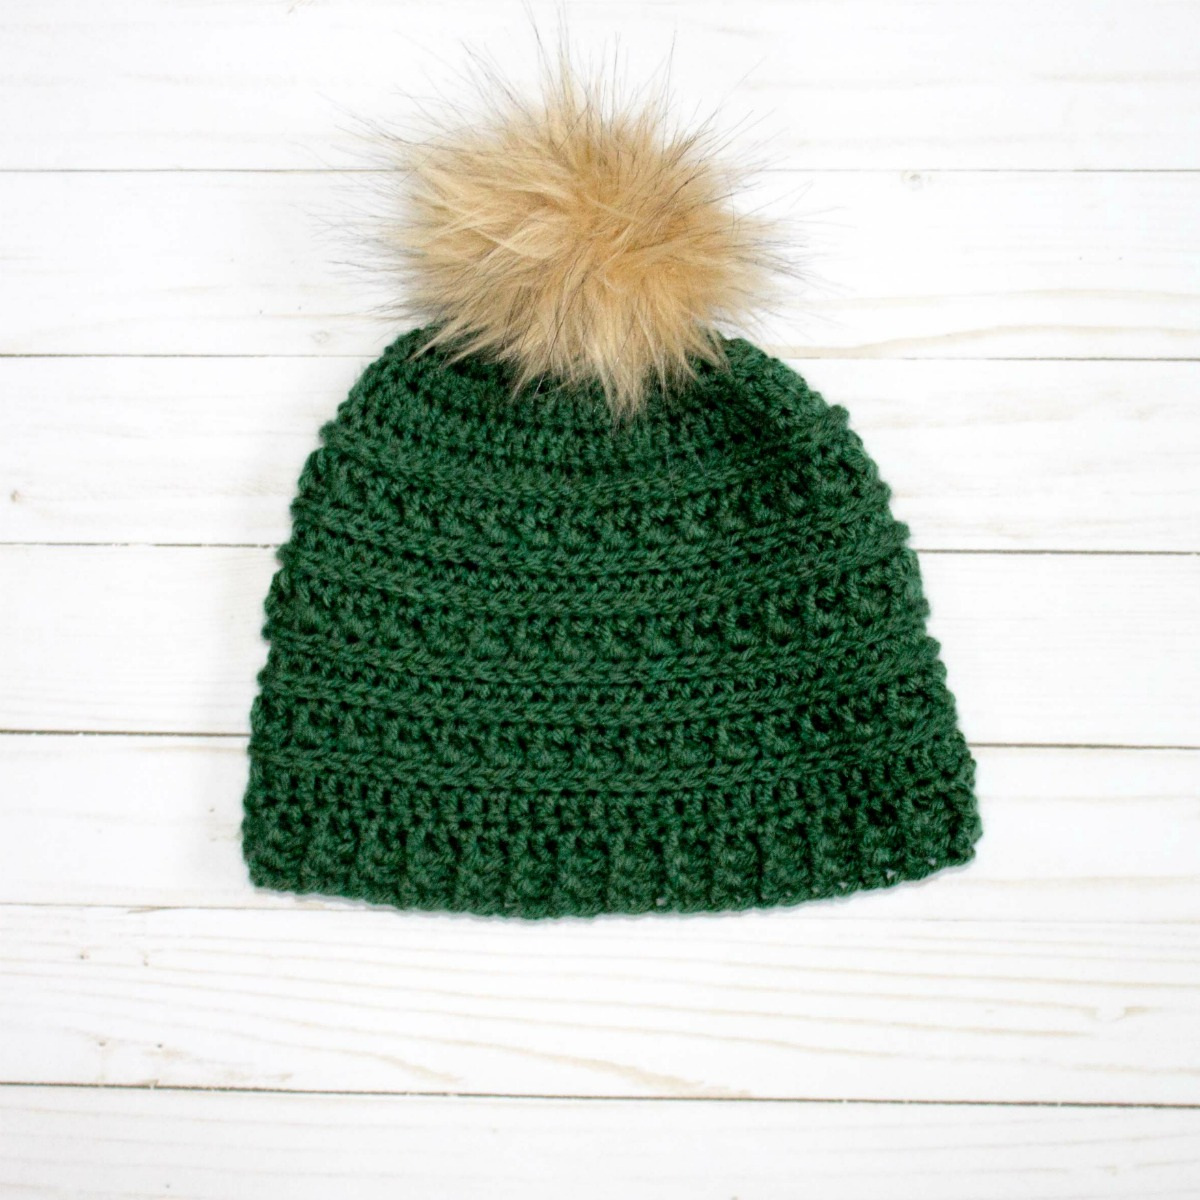 Beanie Pattern Crochet Mountain Ridges Crochet Hat A Free Pattern Thefriendlyredfox